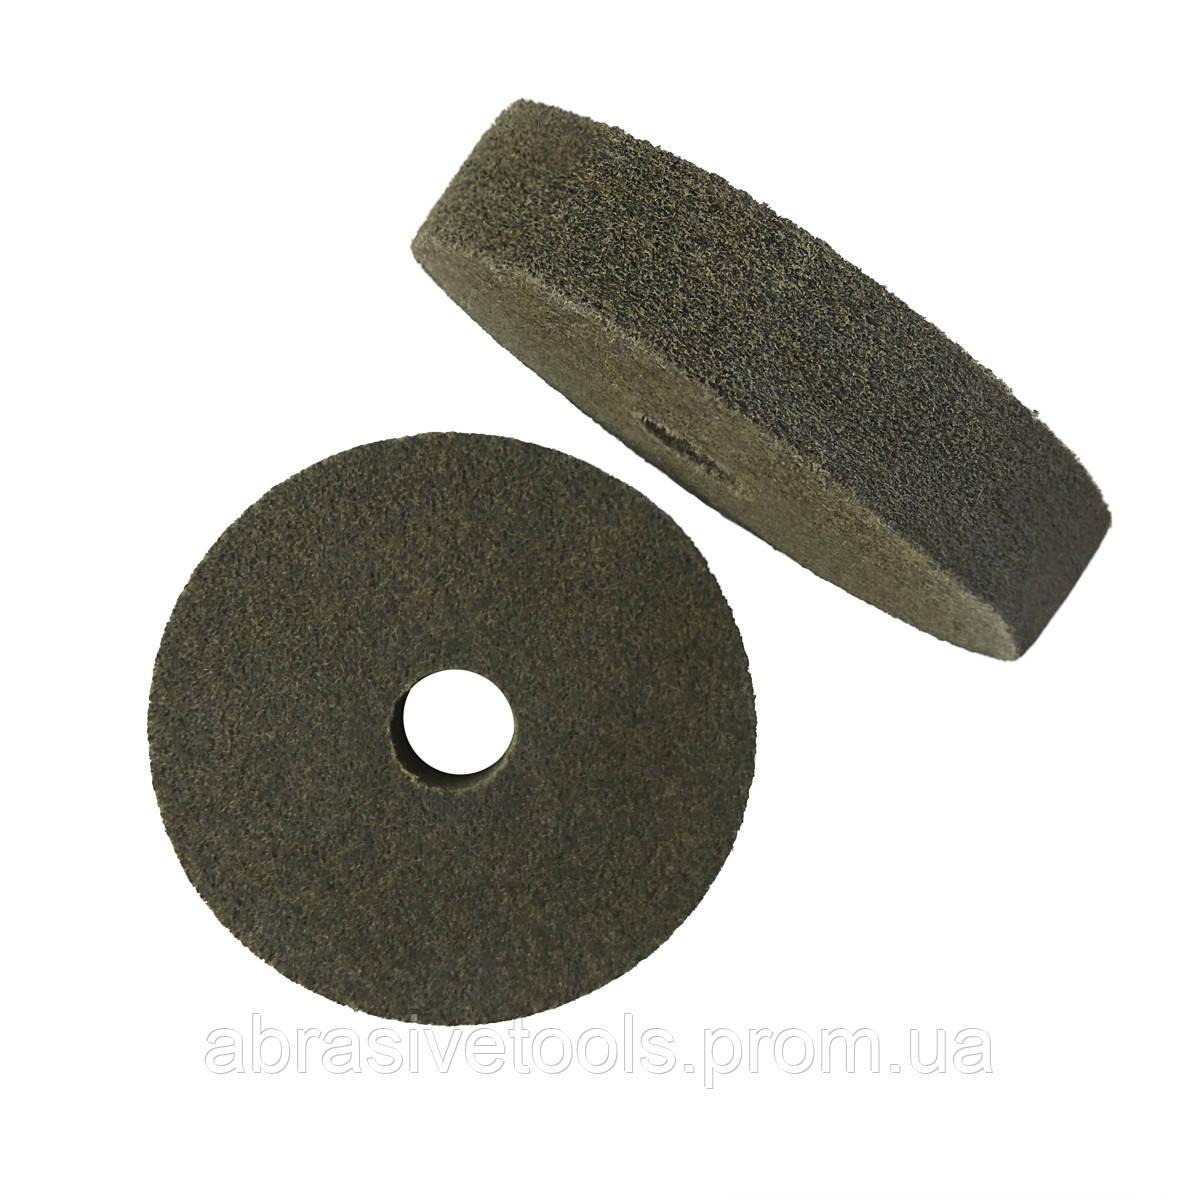 Абразивный диск скотч-брайт 350х50х32 F240, F320, F400, F600 зелёный